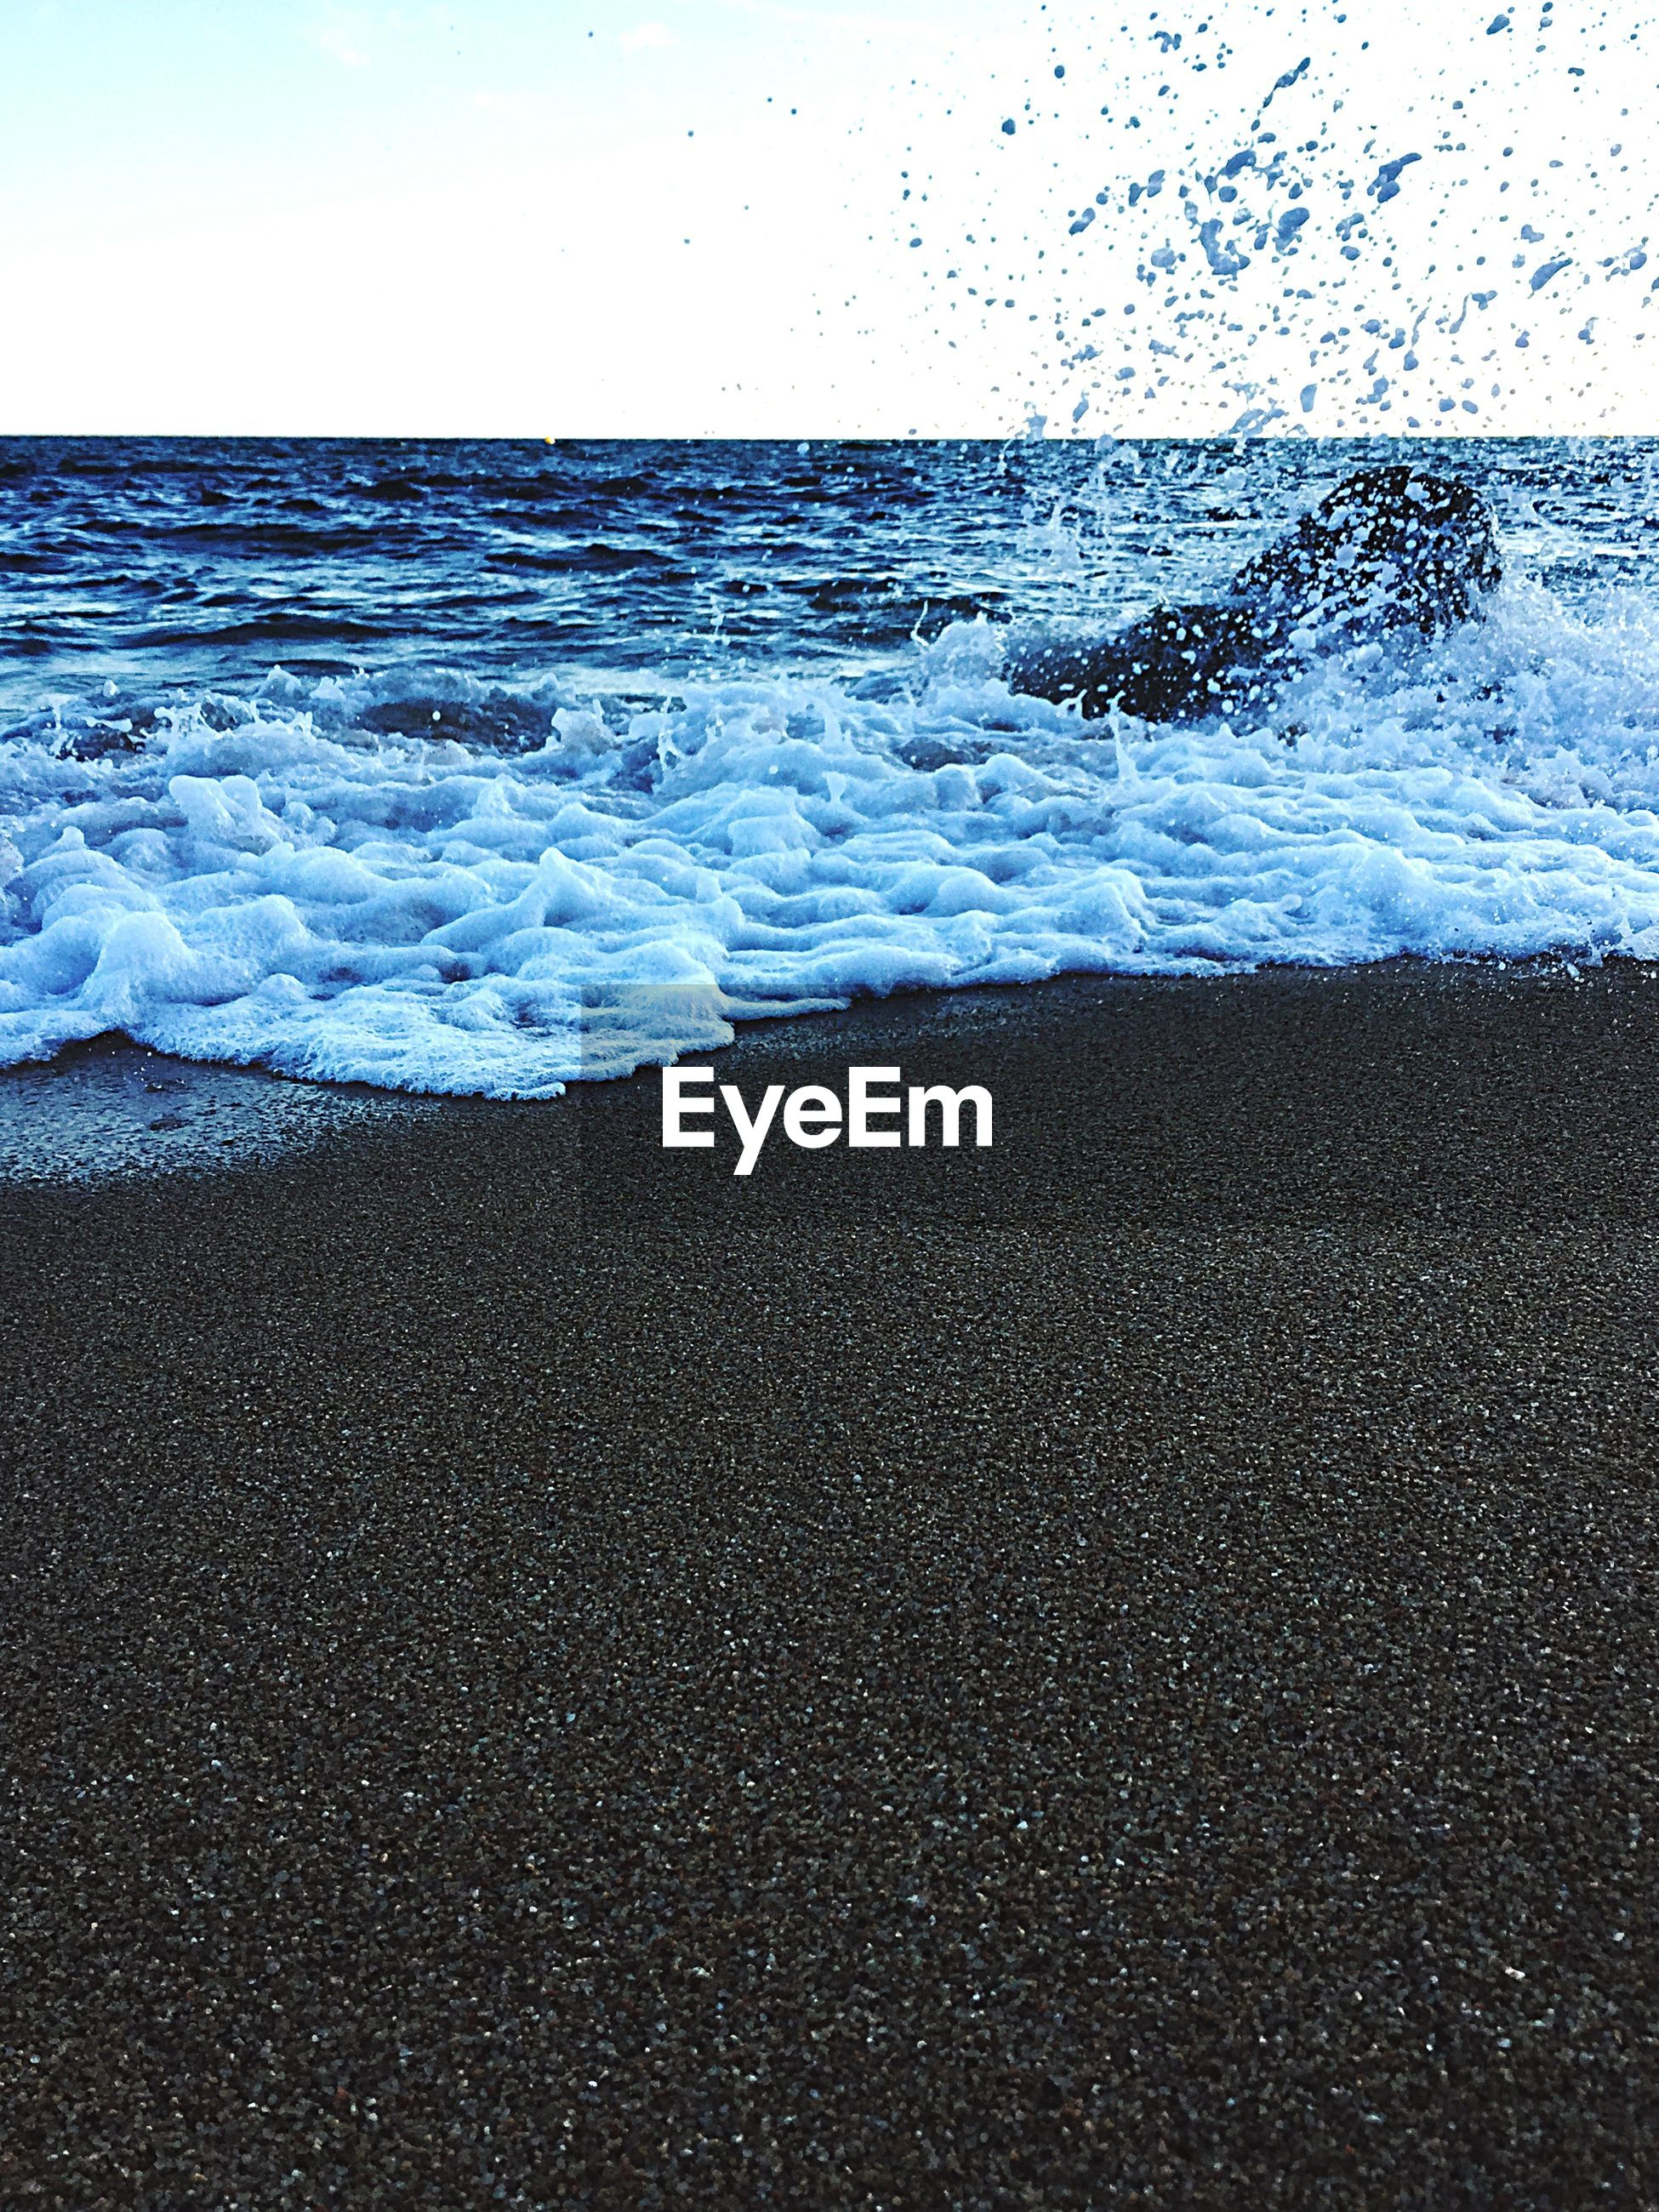 Waves splashing on rock at beach against sky